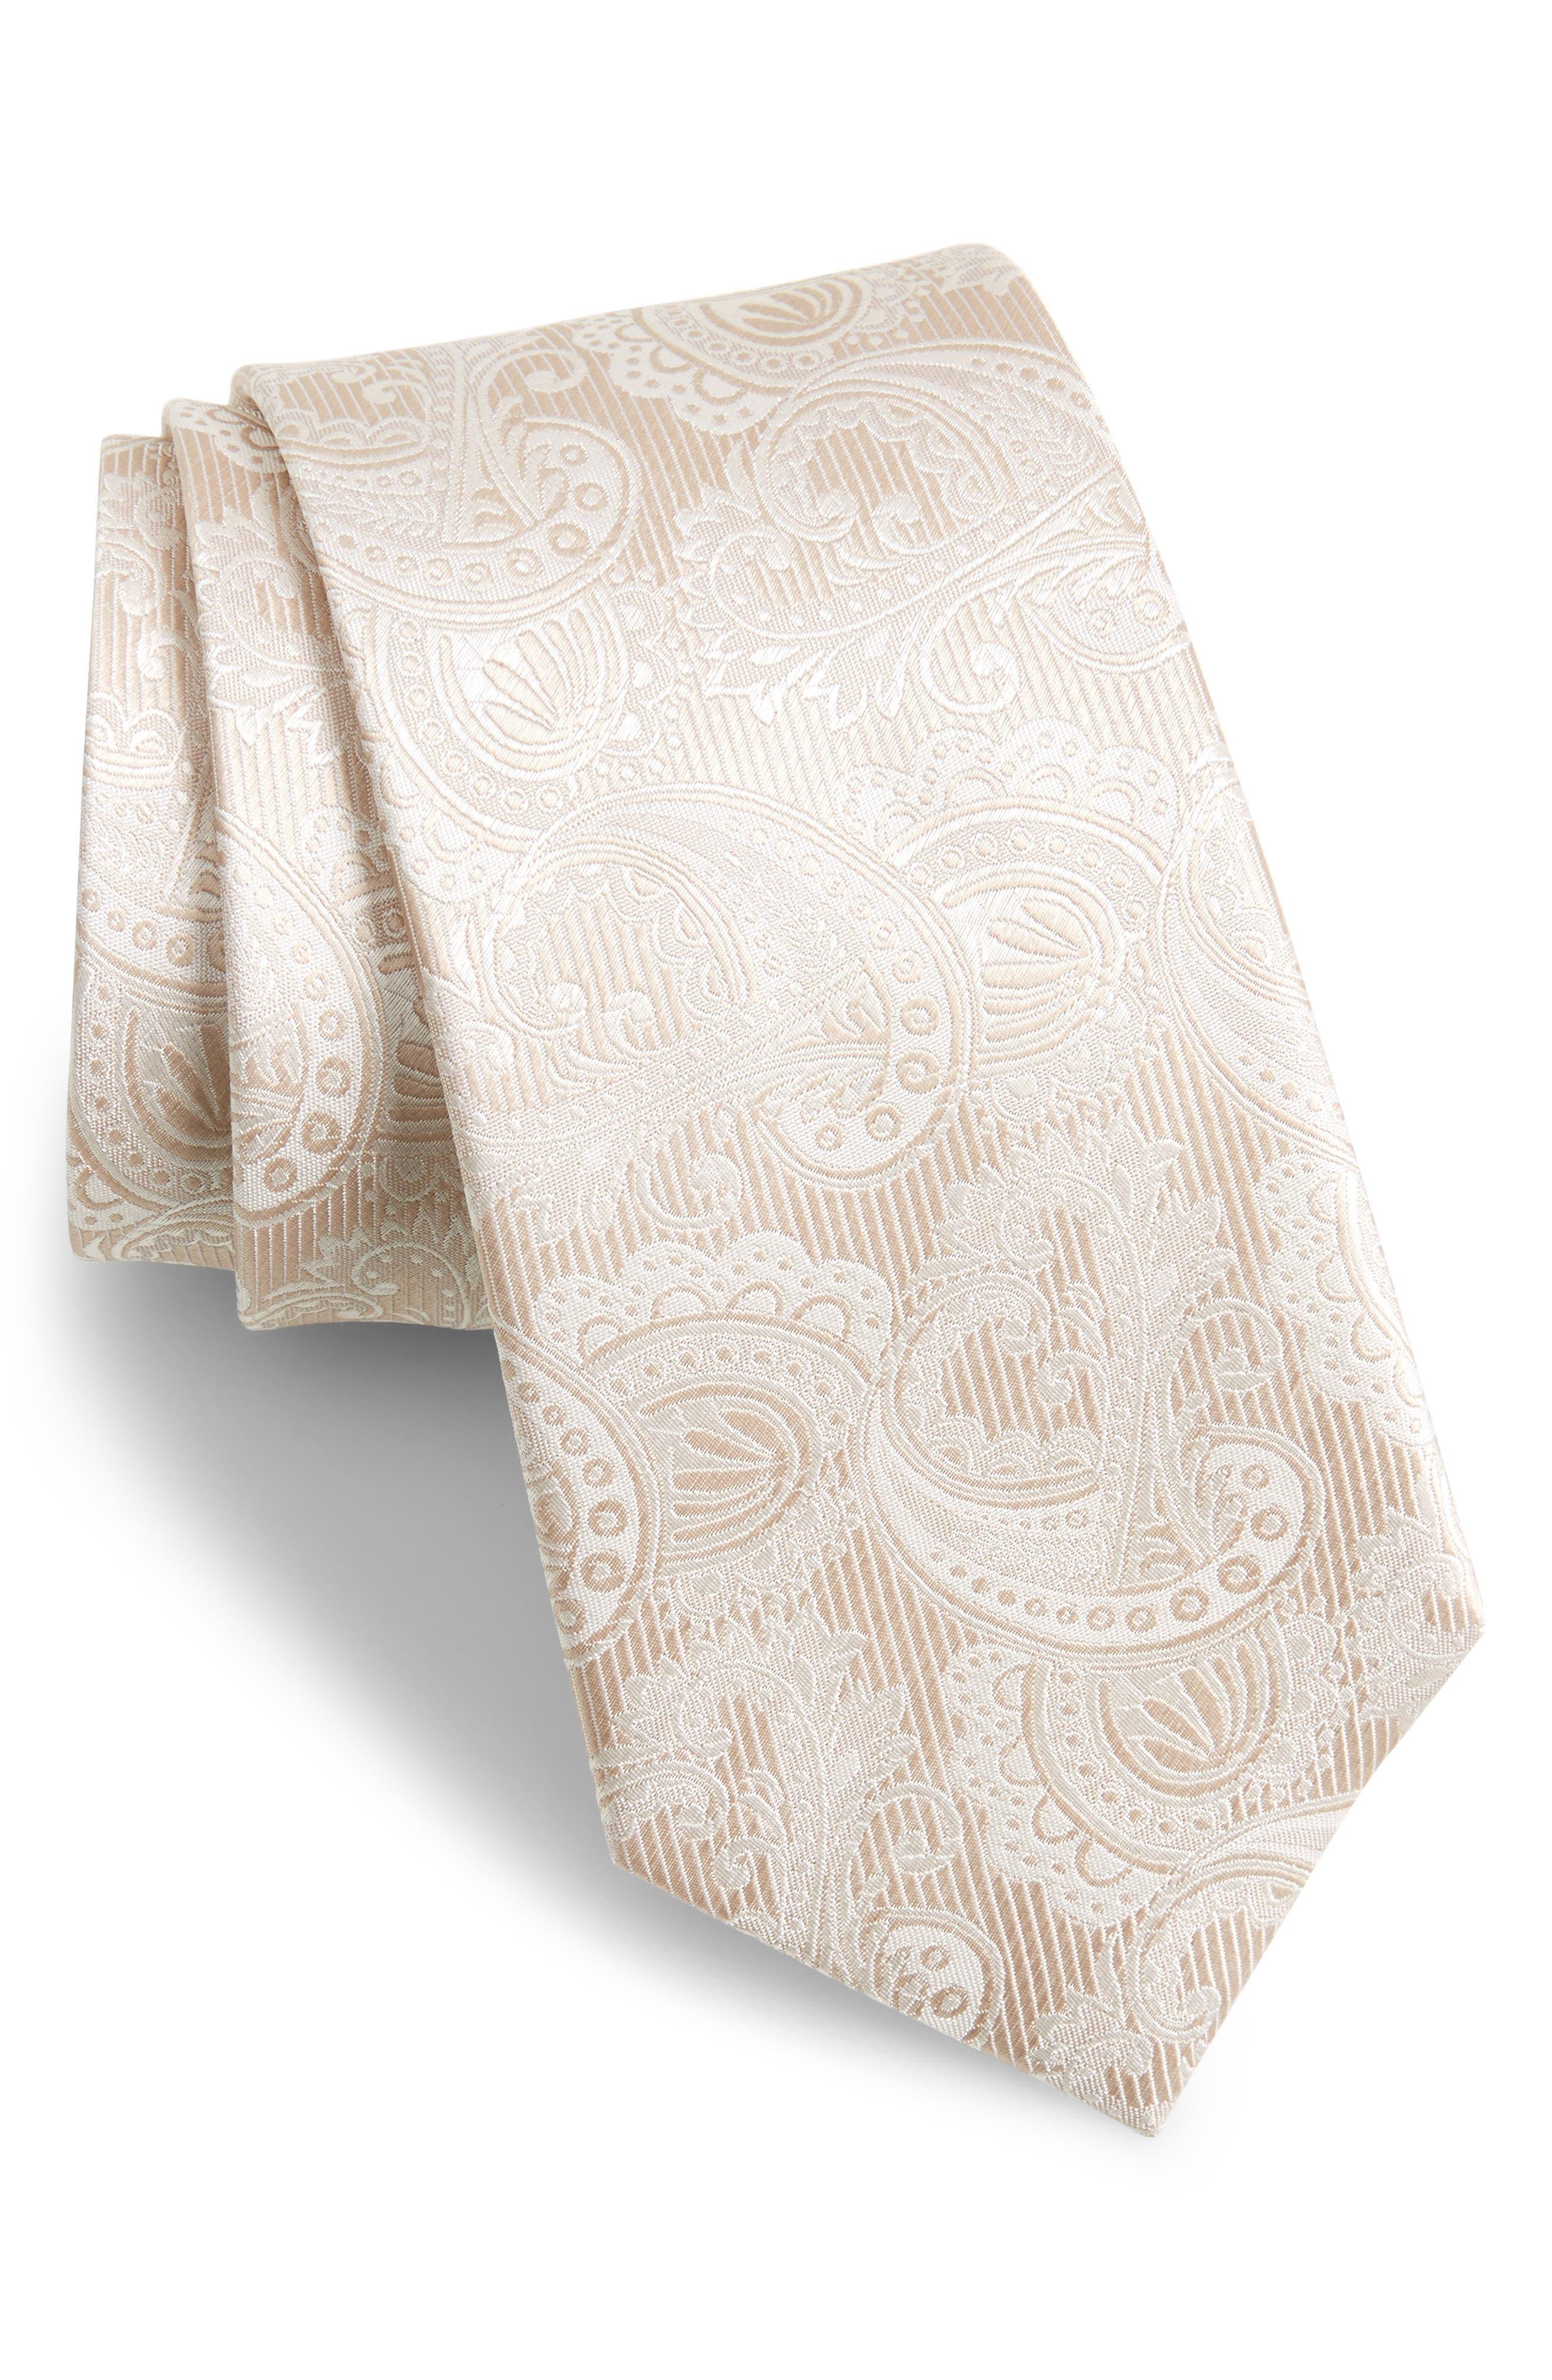 Alternate Image 1 Selected - The Tie Bar Paisley Silk Tie (X-Long)